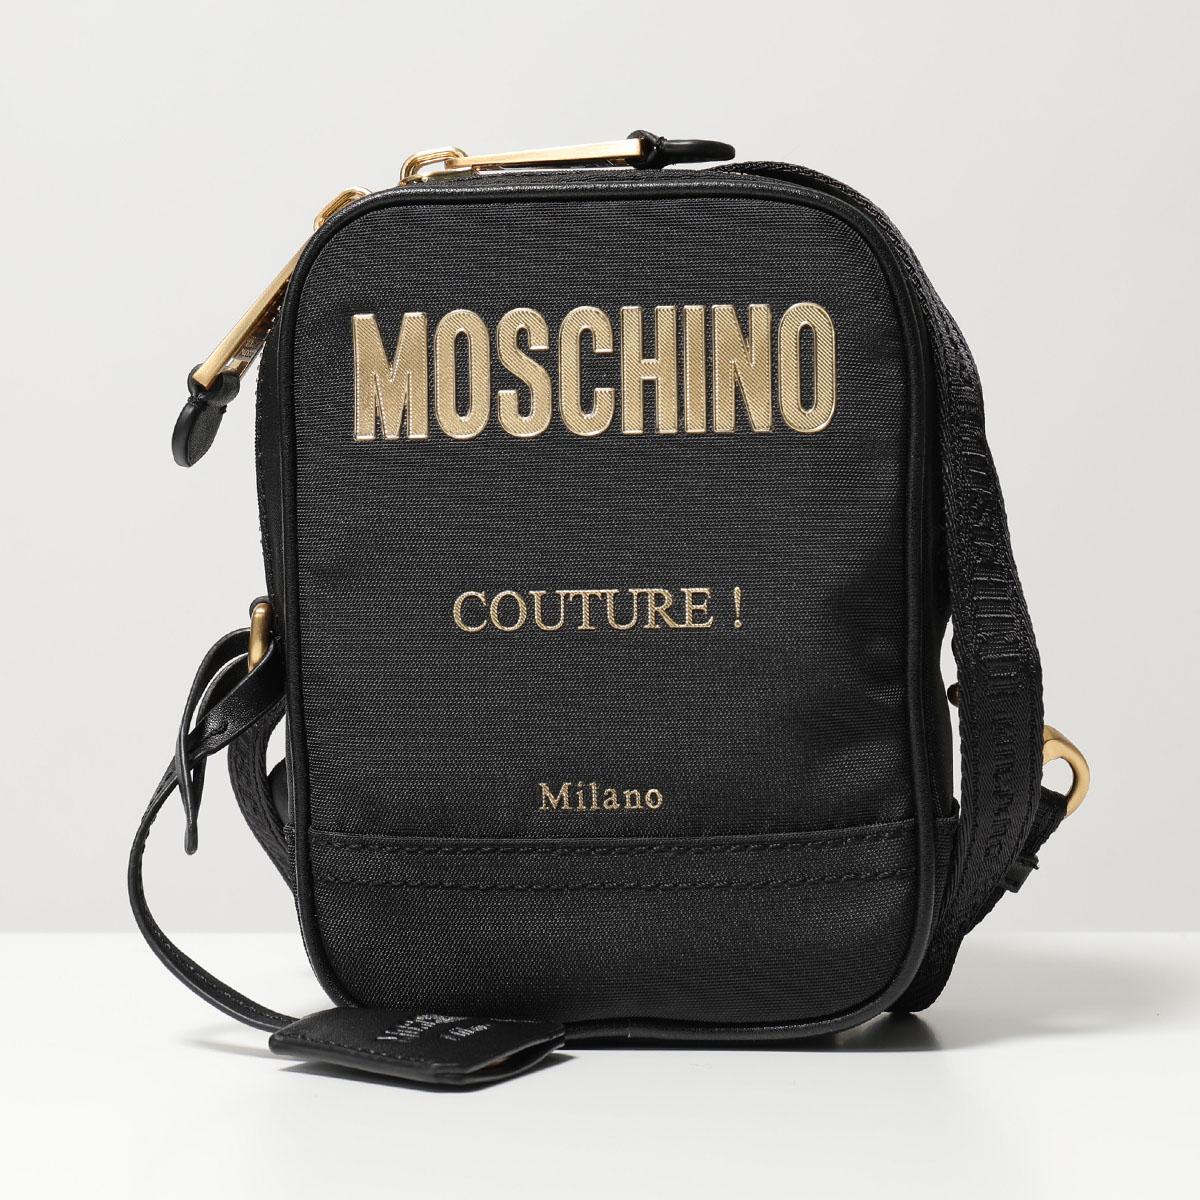 MOSCHINO COUTURE! モスキーノ クチュール 7421 8205 1555 ショルダーバッグ ポシェット サコッシュ 鞄 レディース